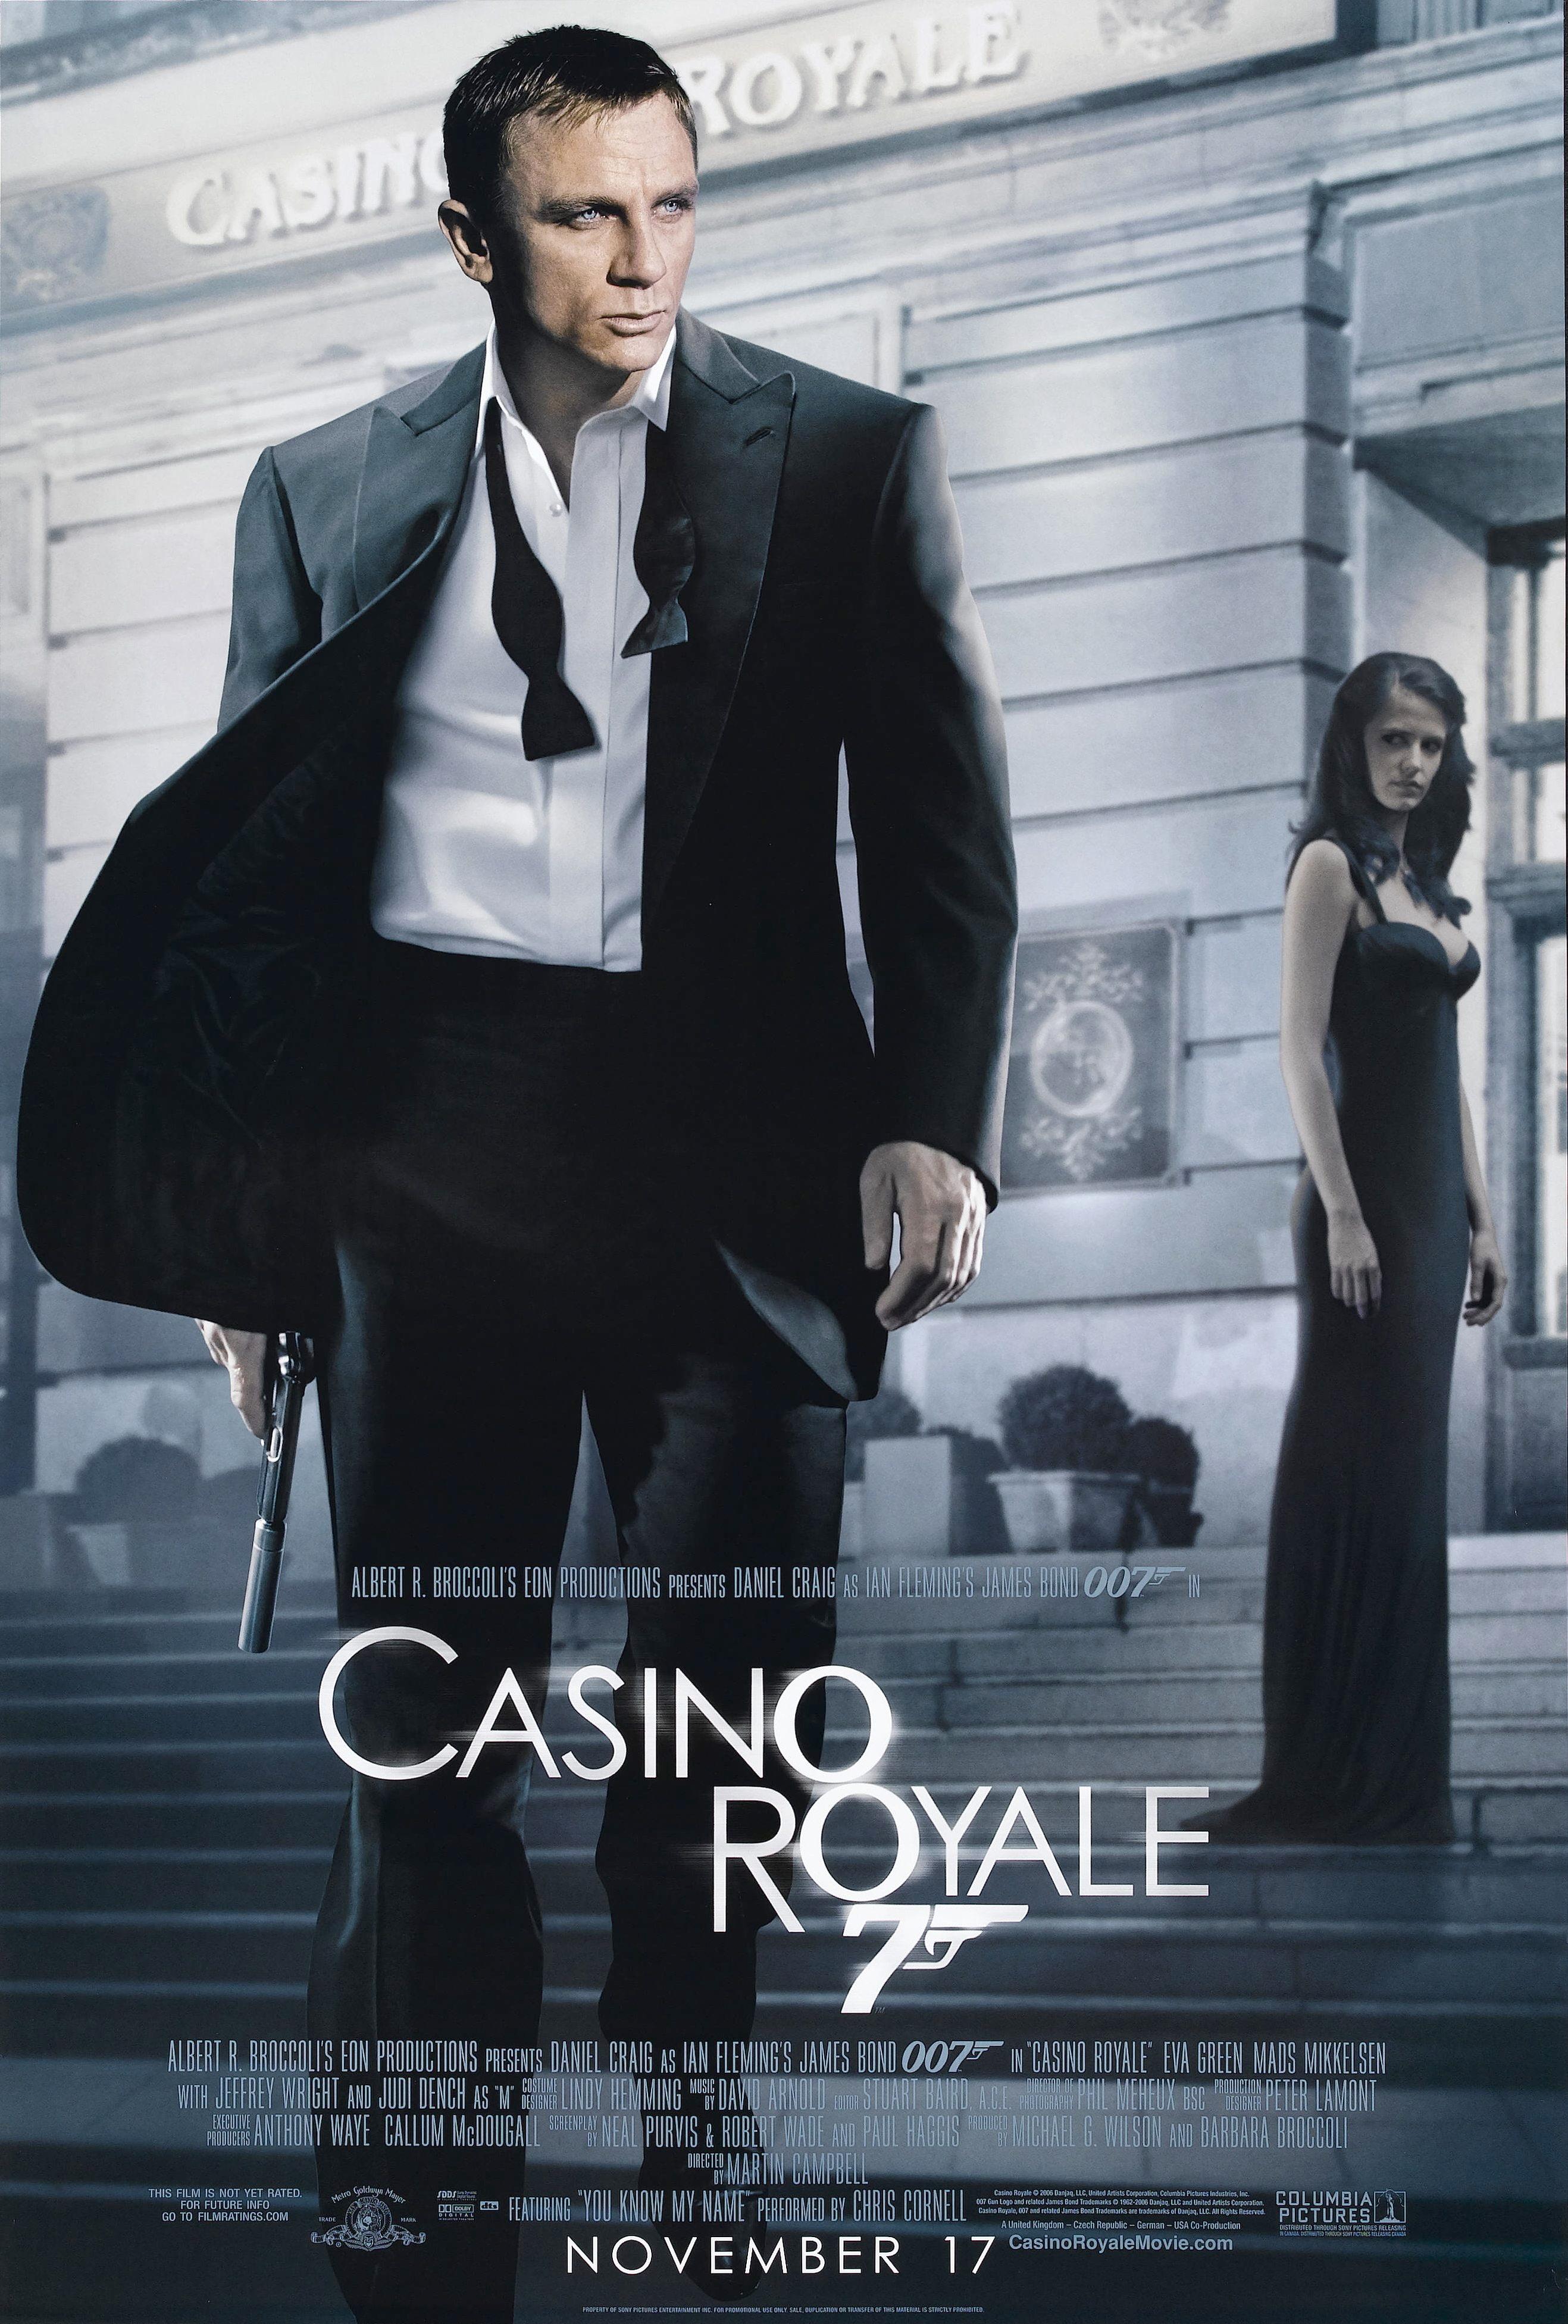 Скачать фильм casino royale dvd9 коды на grand theft auto sanandreas casino royale